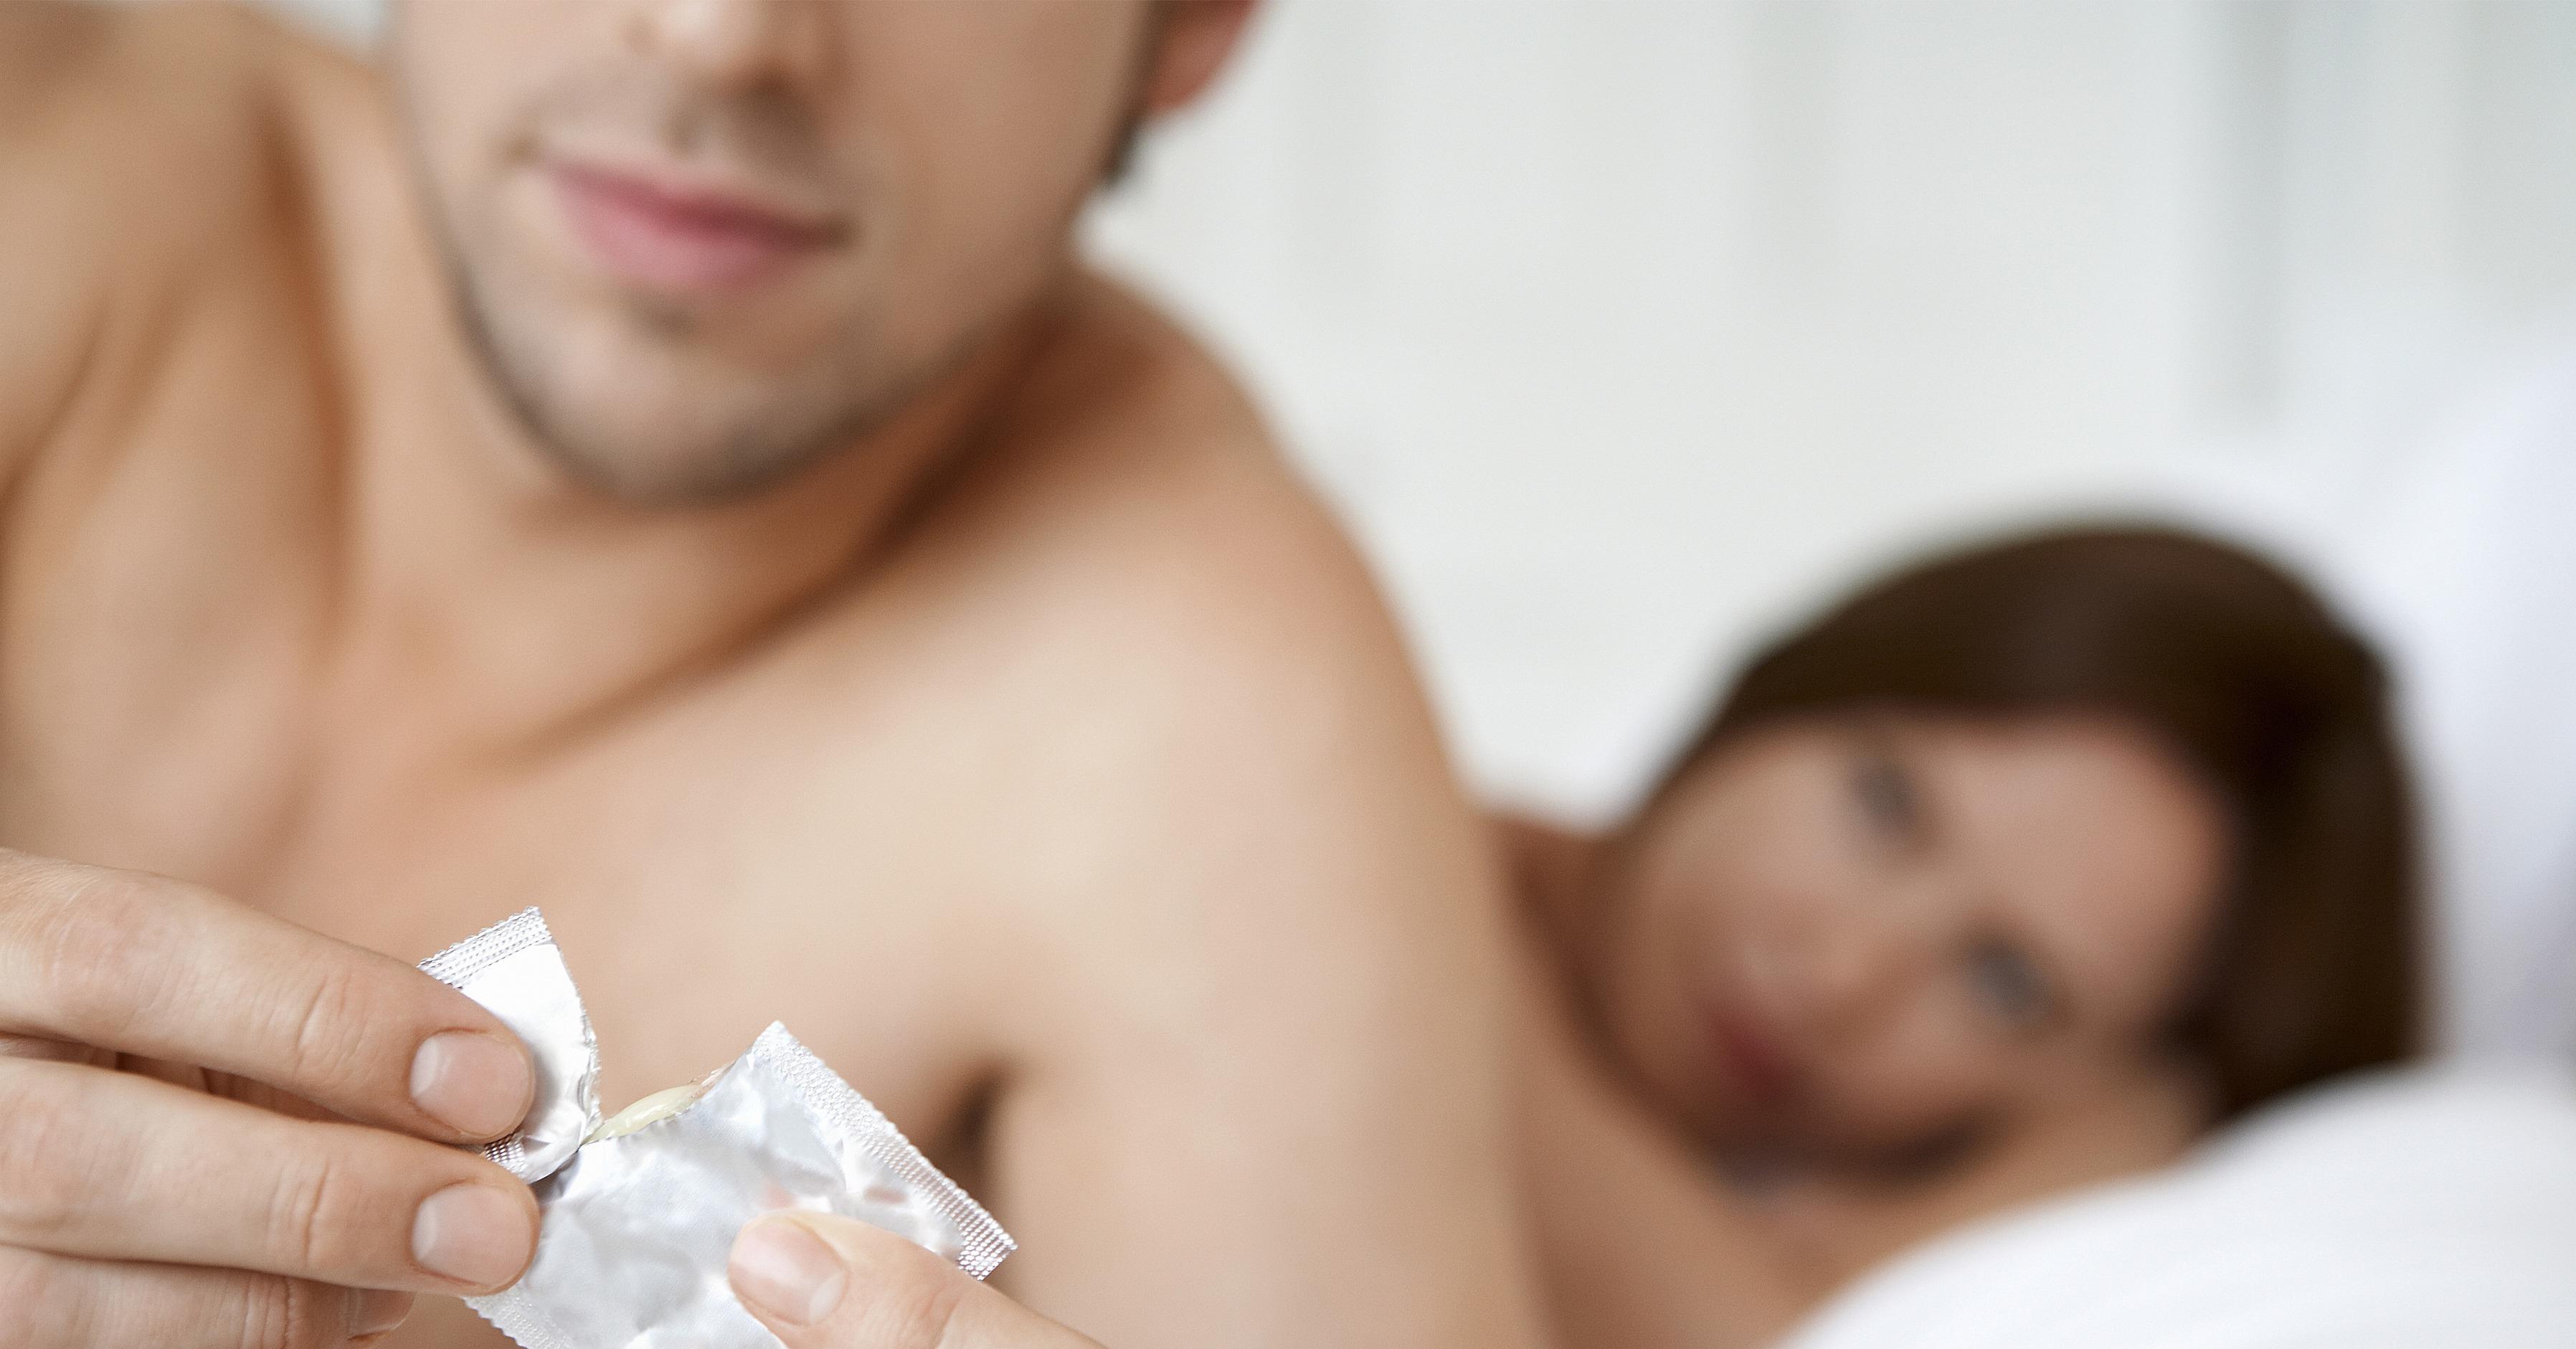 Фото секса з презервативом 28 фотография